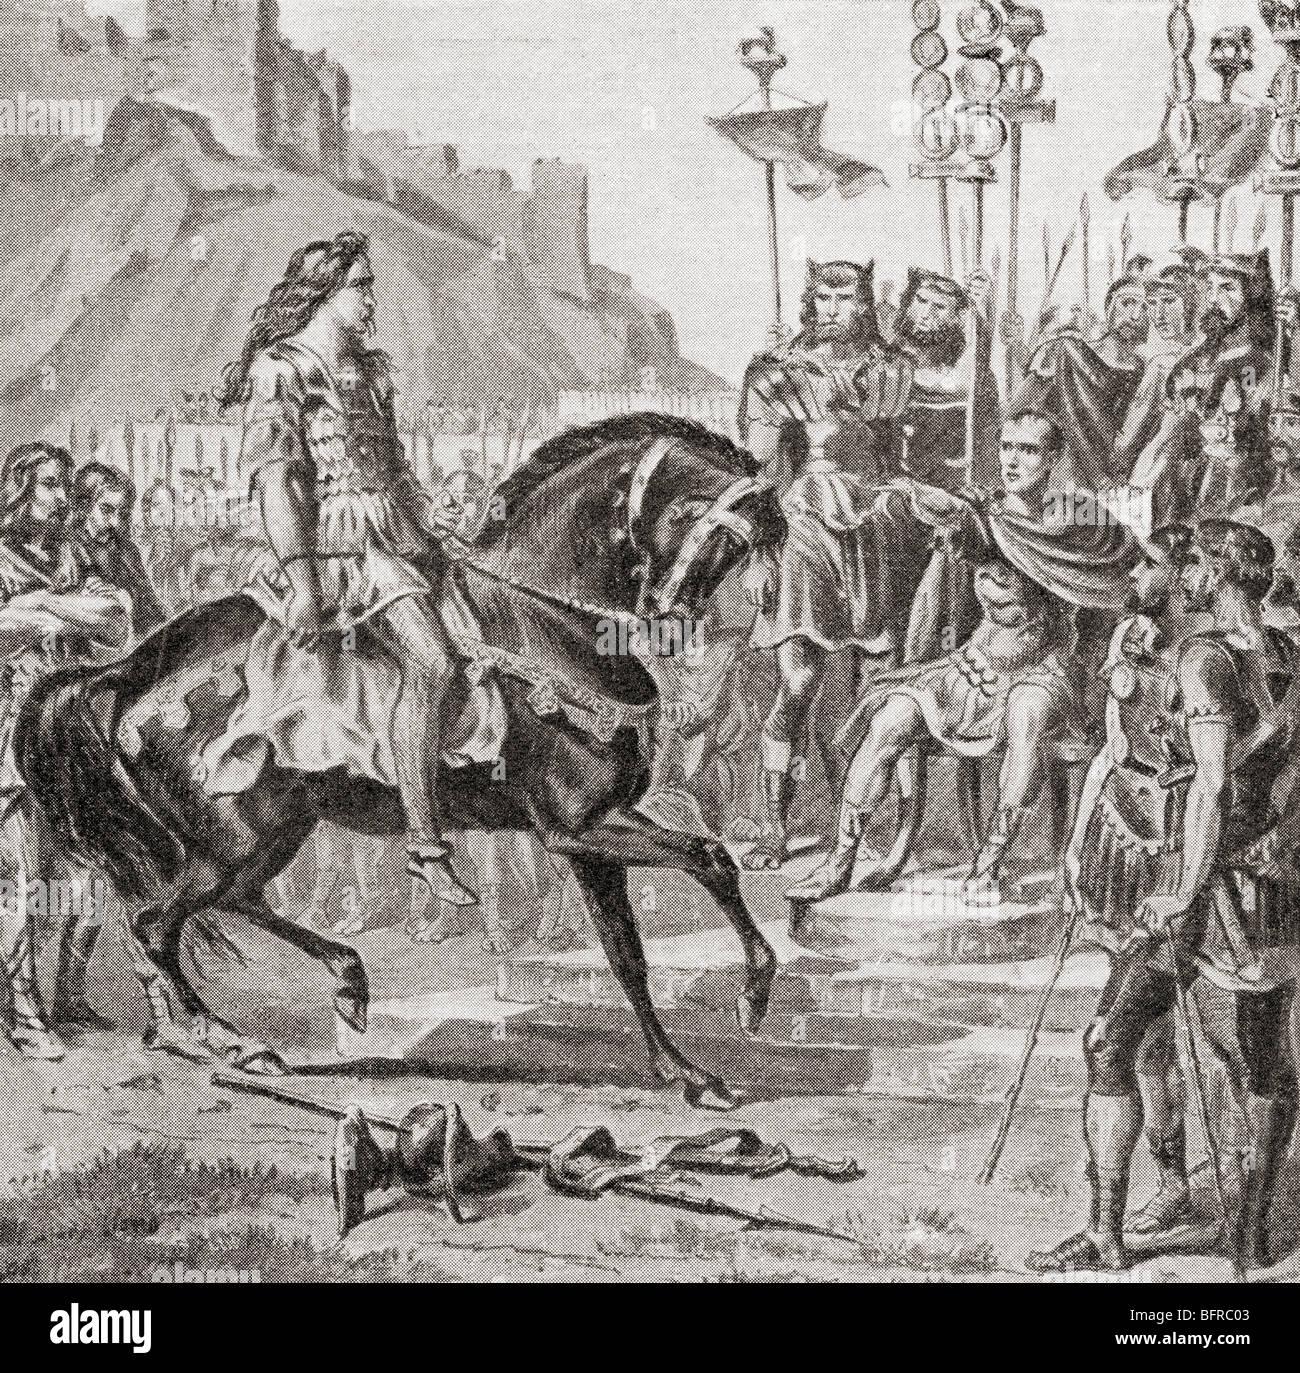 Vercingetorix the Gallic leader throws down his arms before Julius Caesar, 52BC. - Stock Image